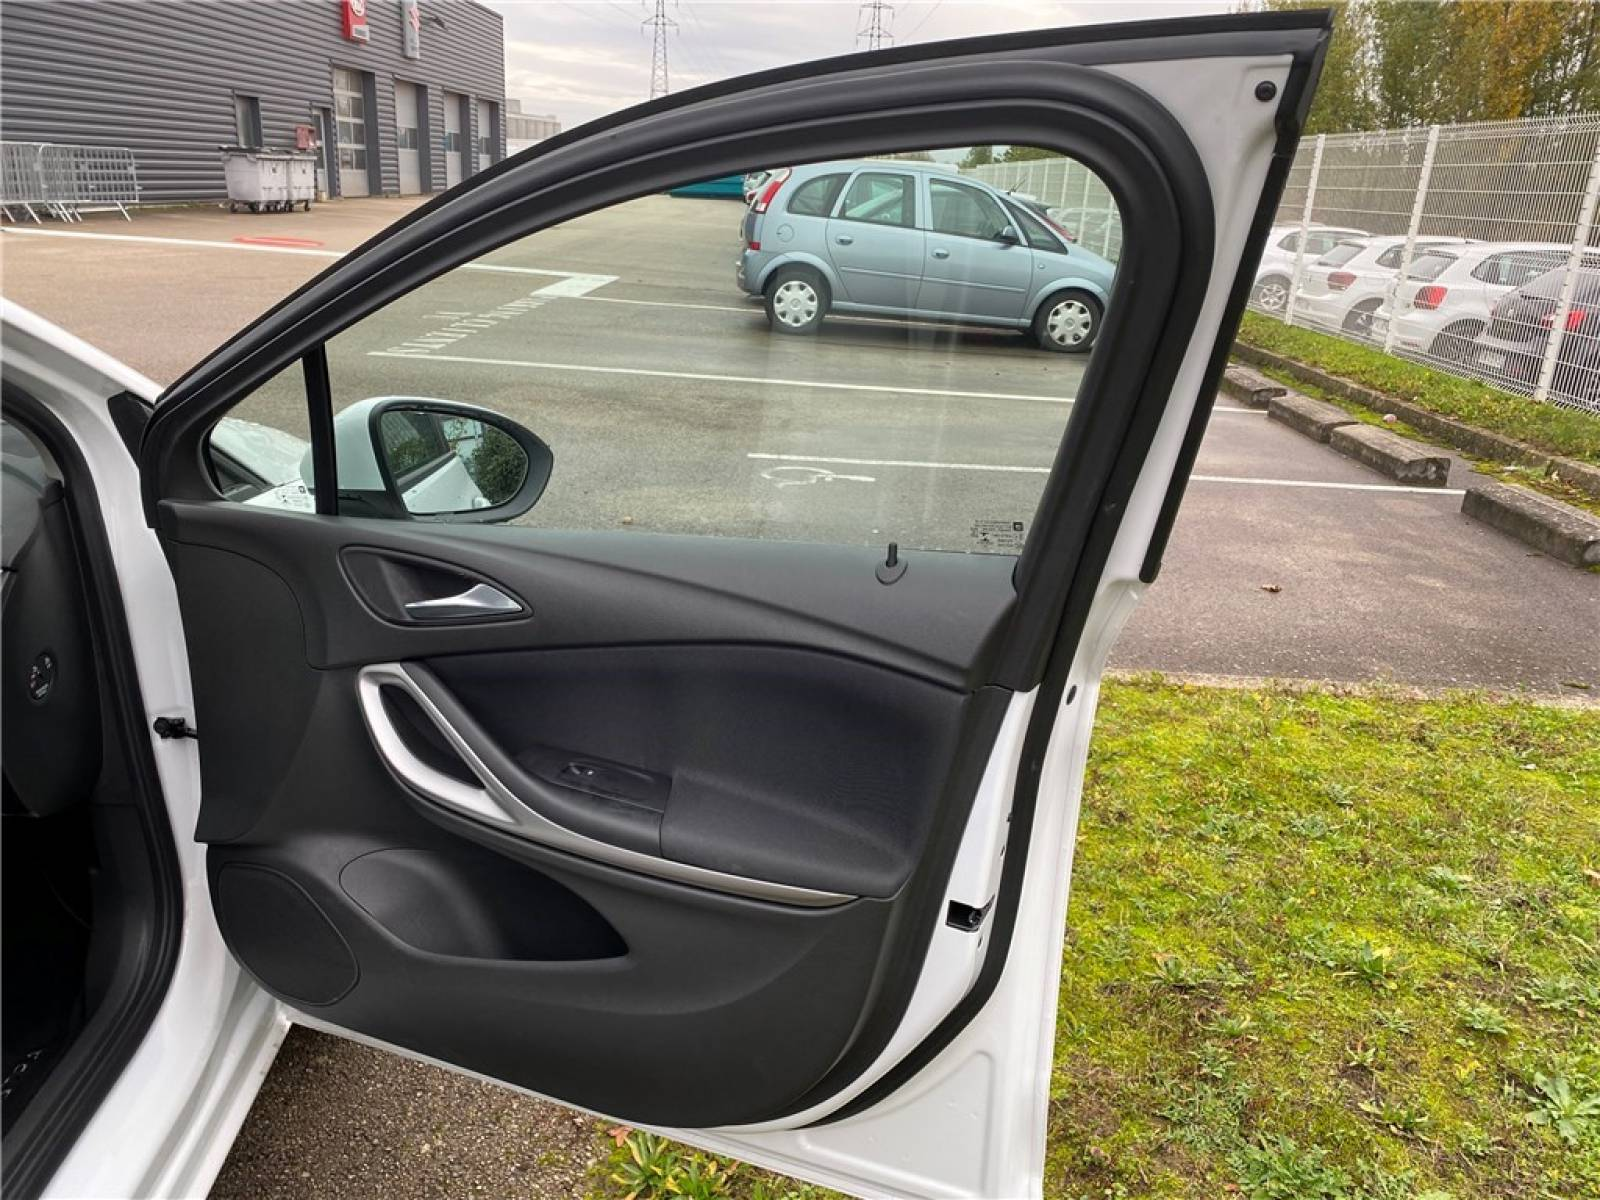 OPEL Astra 1.5 Diesel 105 ch BVM6 - véhicule d'occasion - Groupe Guillet - Opel Magicauto - Chalon-sur-Saône - 71380 - Saint-Marcel - 33